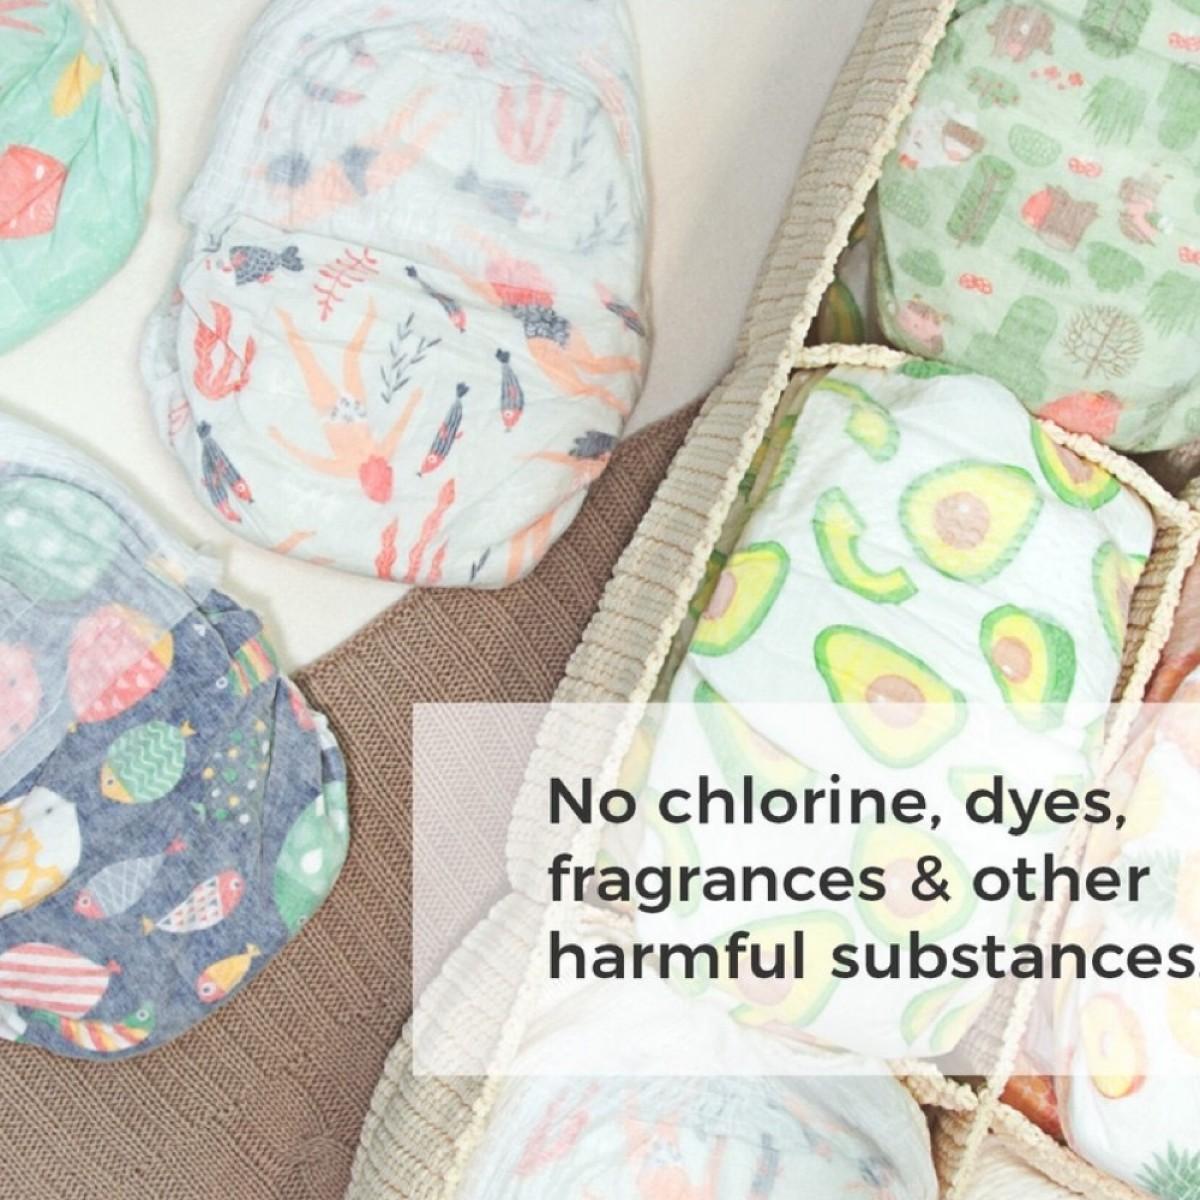 Offspring Chroline-Free Fashioned Tape Diaper XL 30pcs - 9 Designs